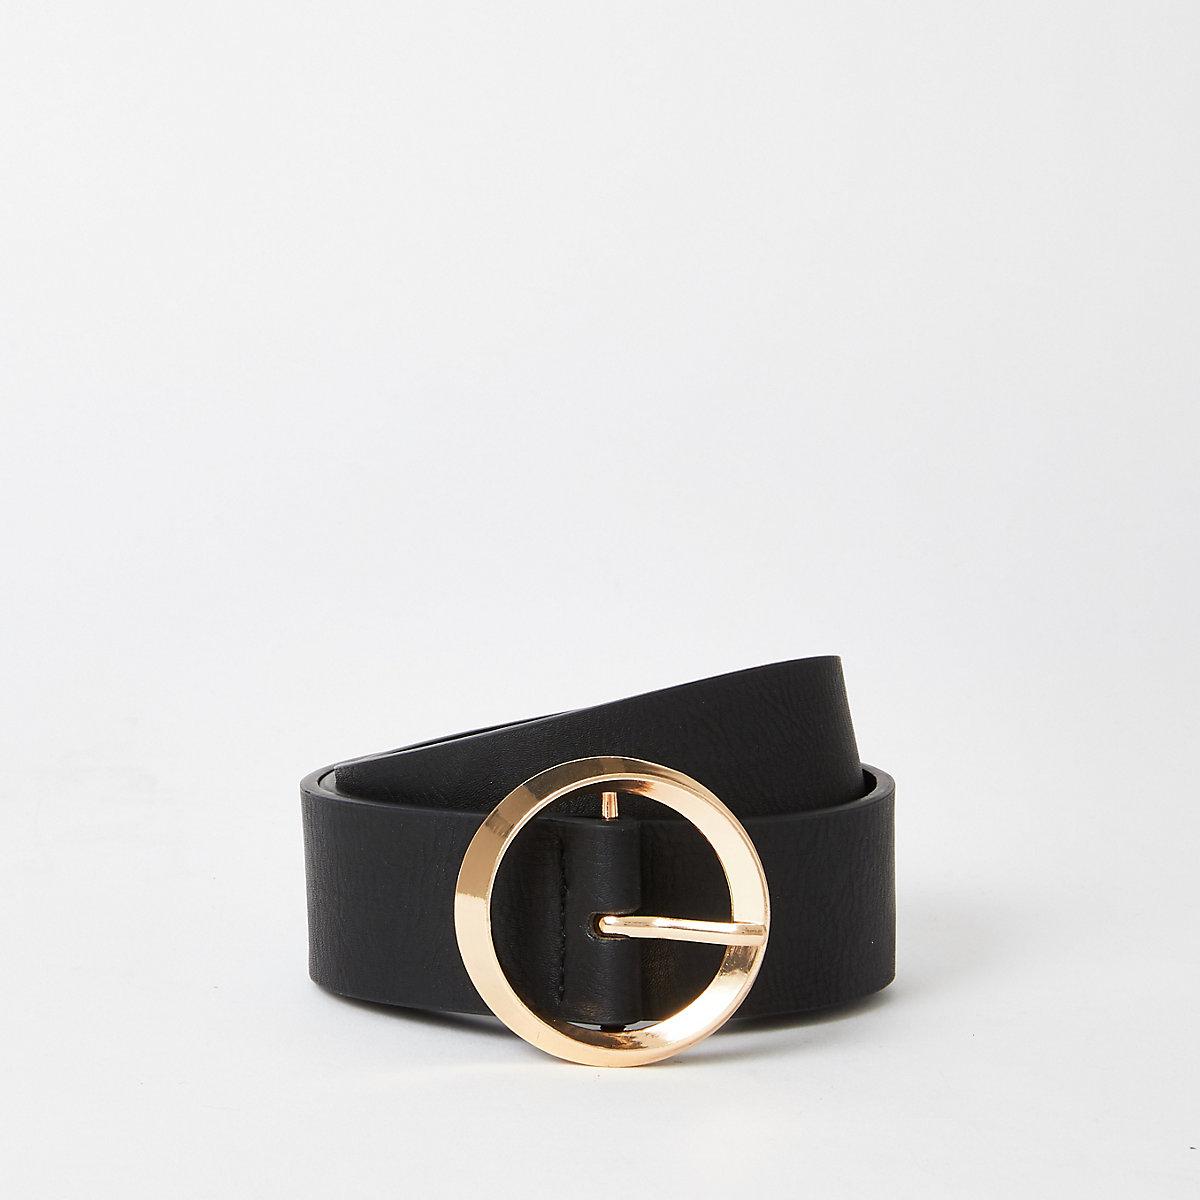 Black gold tone circle ring belt